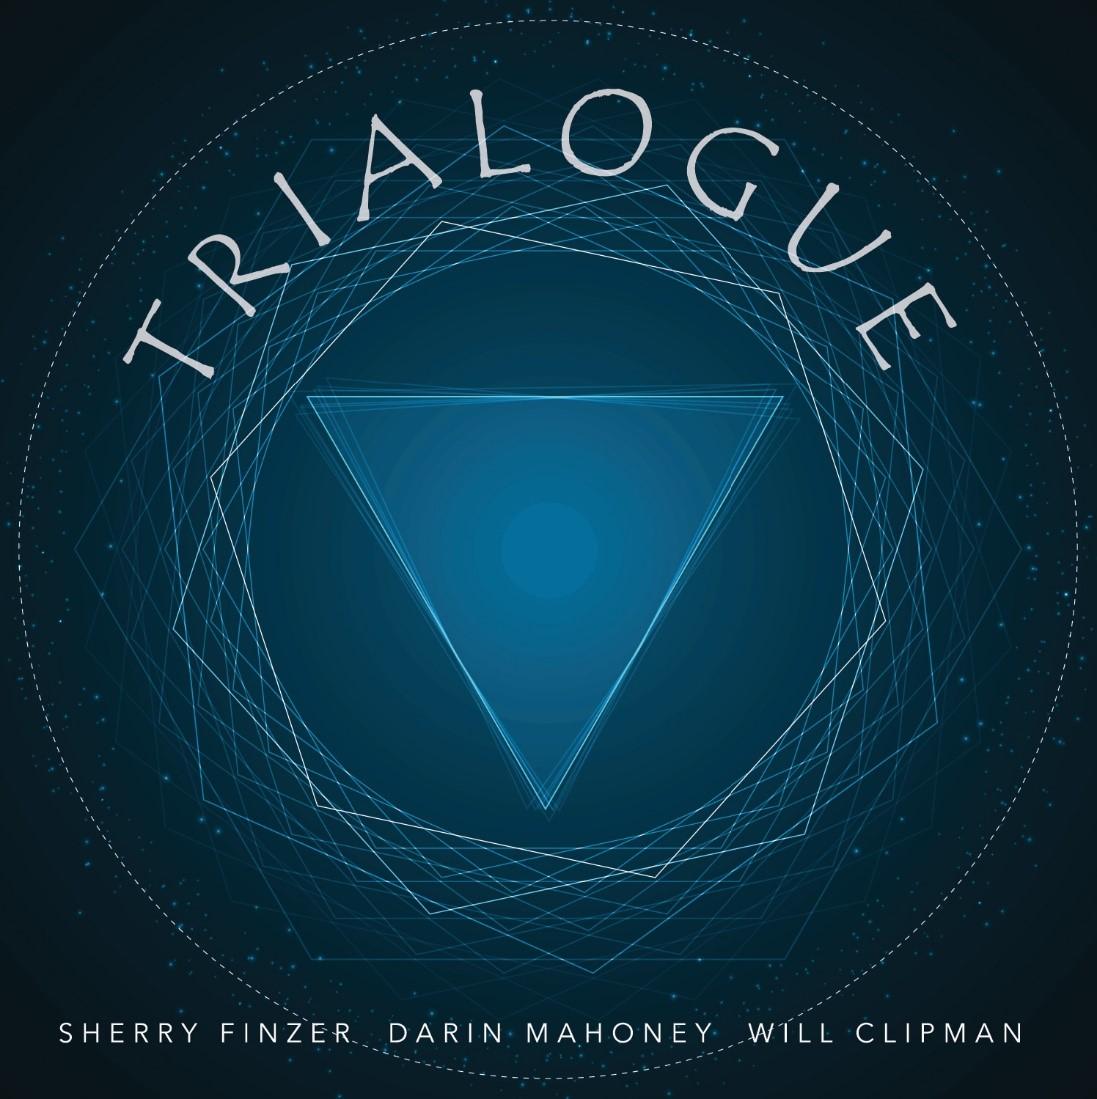 Trialogue by Sherry Finzer, Darin Mahoney & Will Clipman